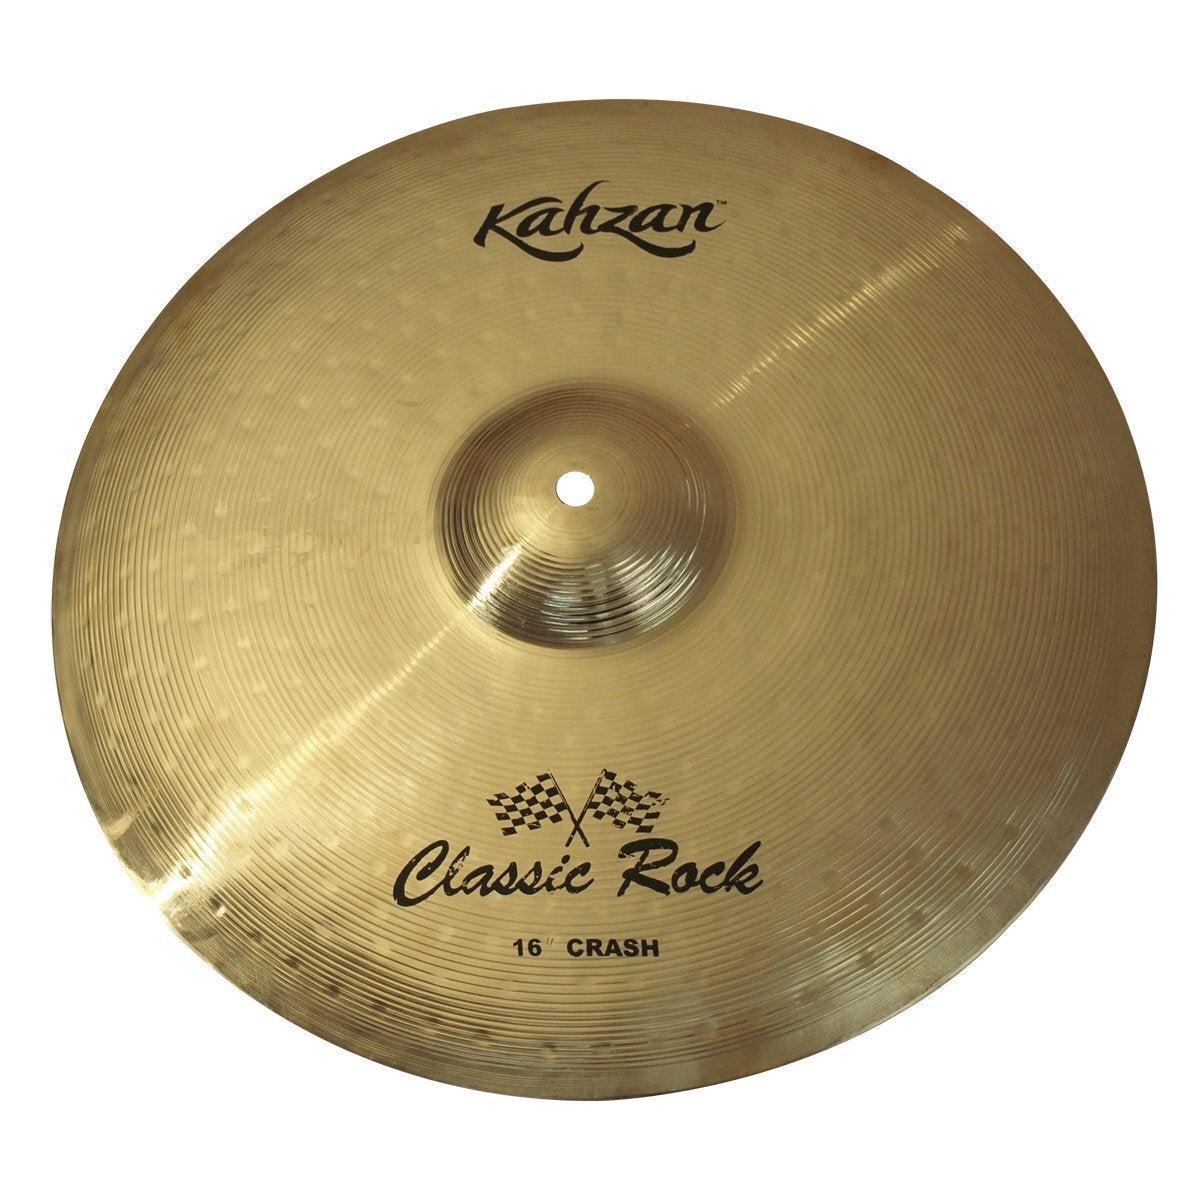 "Kahzan 'Classic Rock Series' Crash Cymbal 16"""